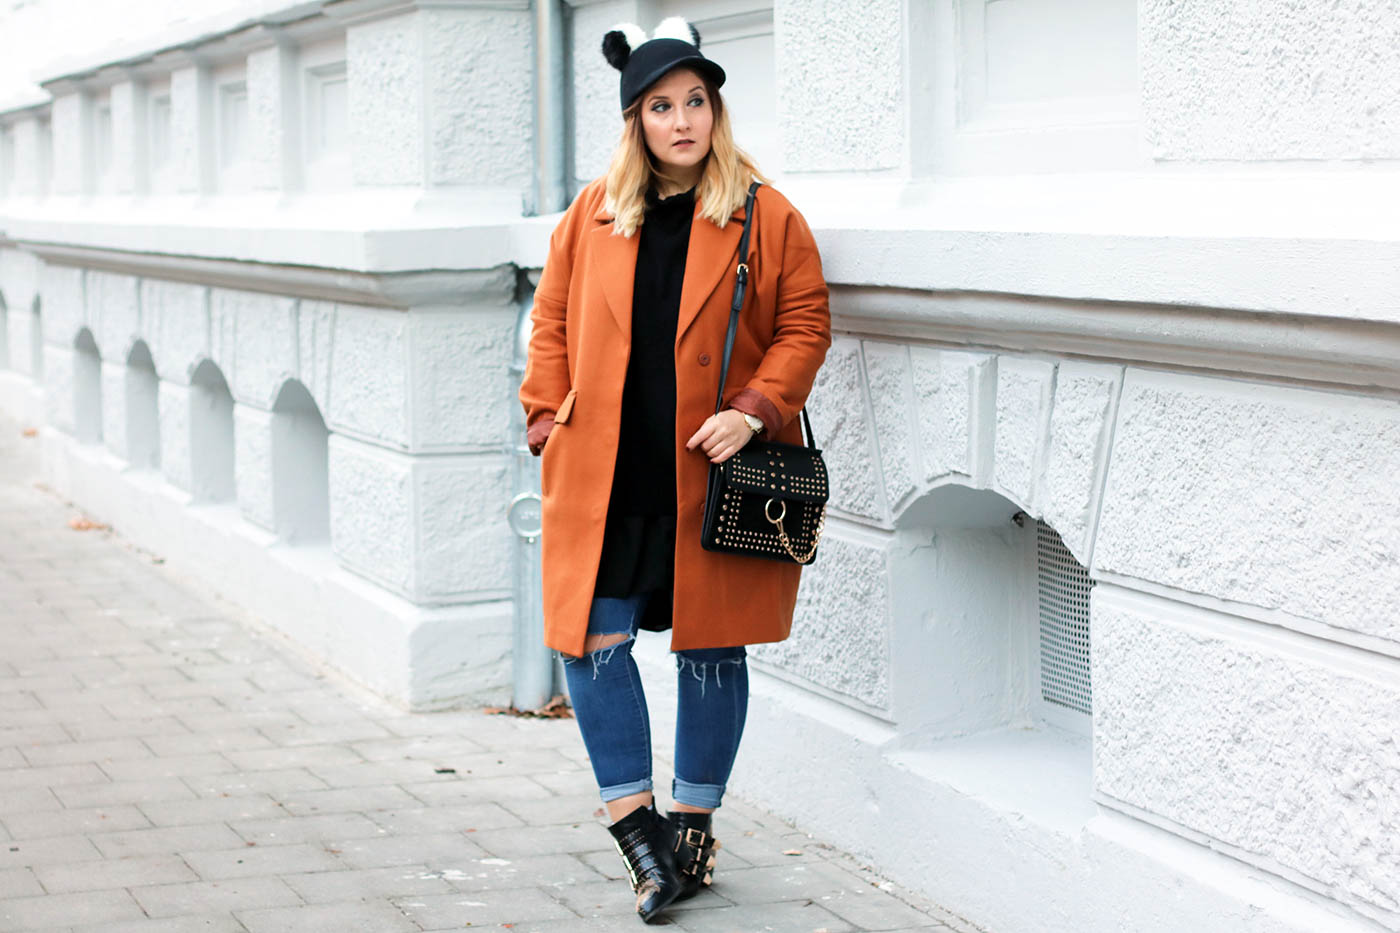 outfit-look-style-mantel-cappe-fashionblog-modeblog-gewinnspiel16